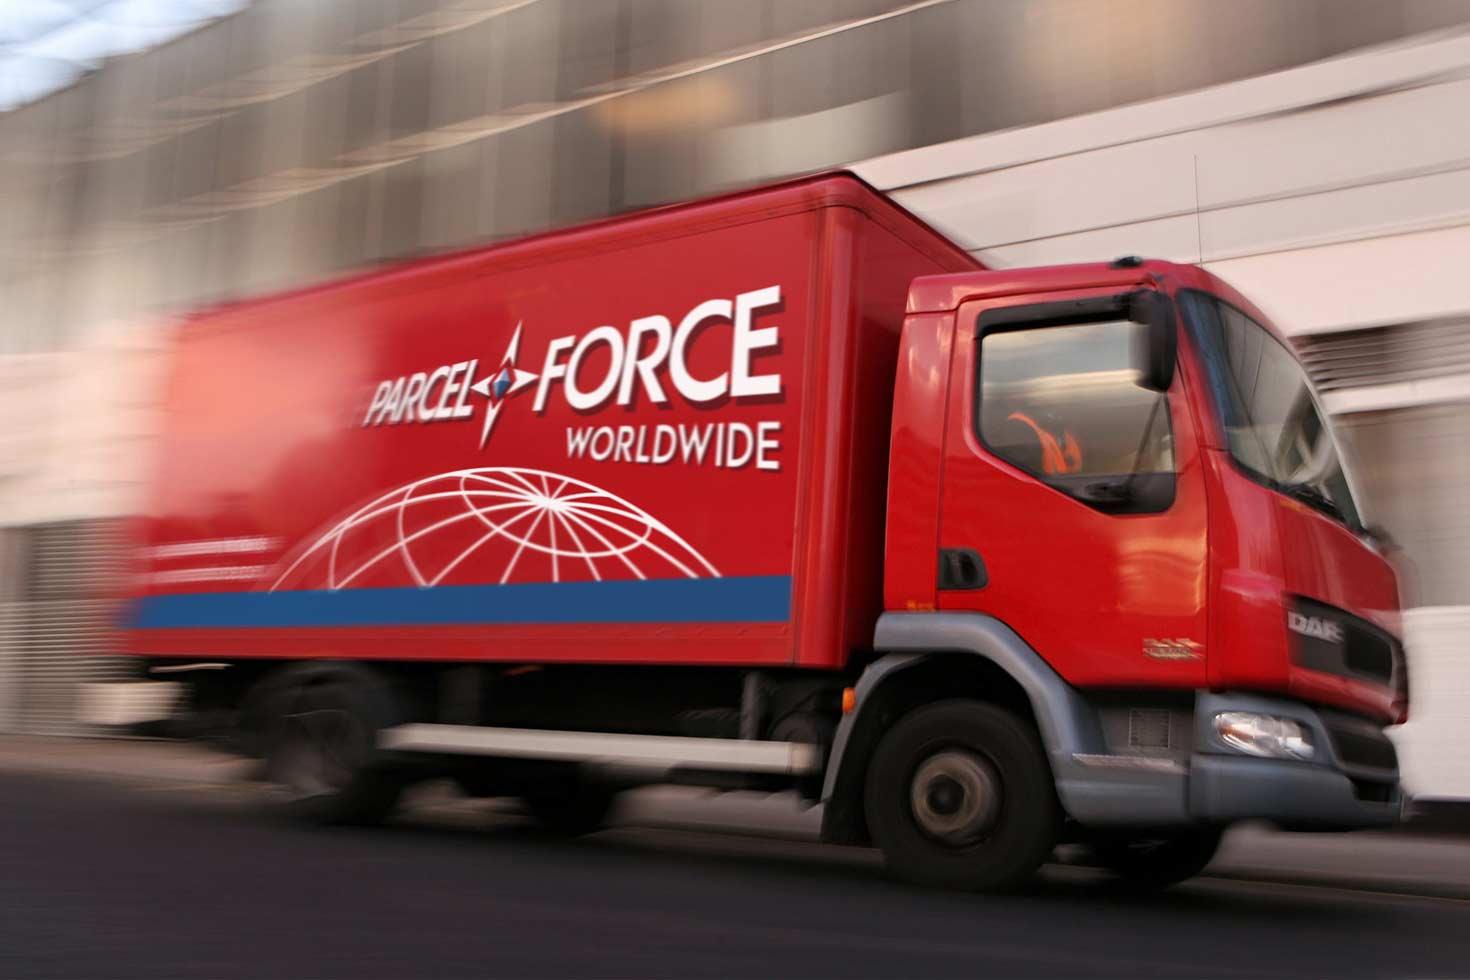 Parcelforce logo on truck